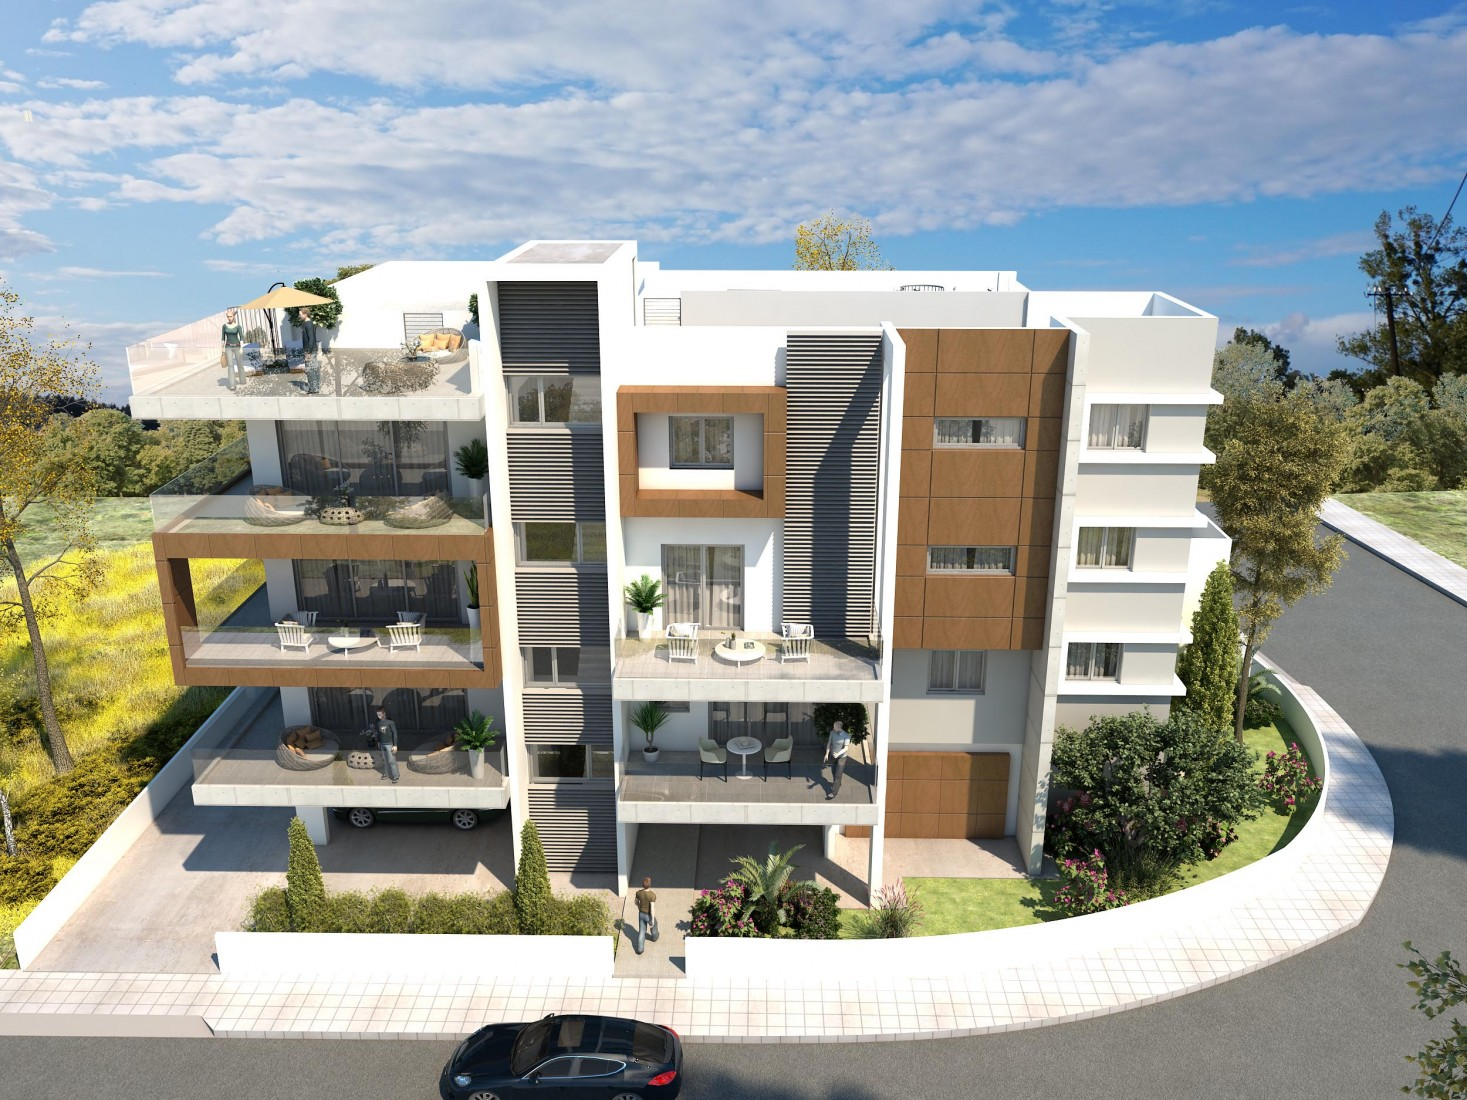 Elite Design | Roof Garden in Strovolos, Nicosia | M.Residence